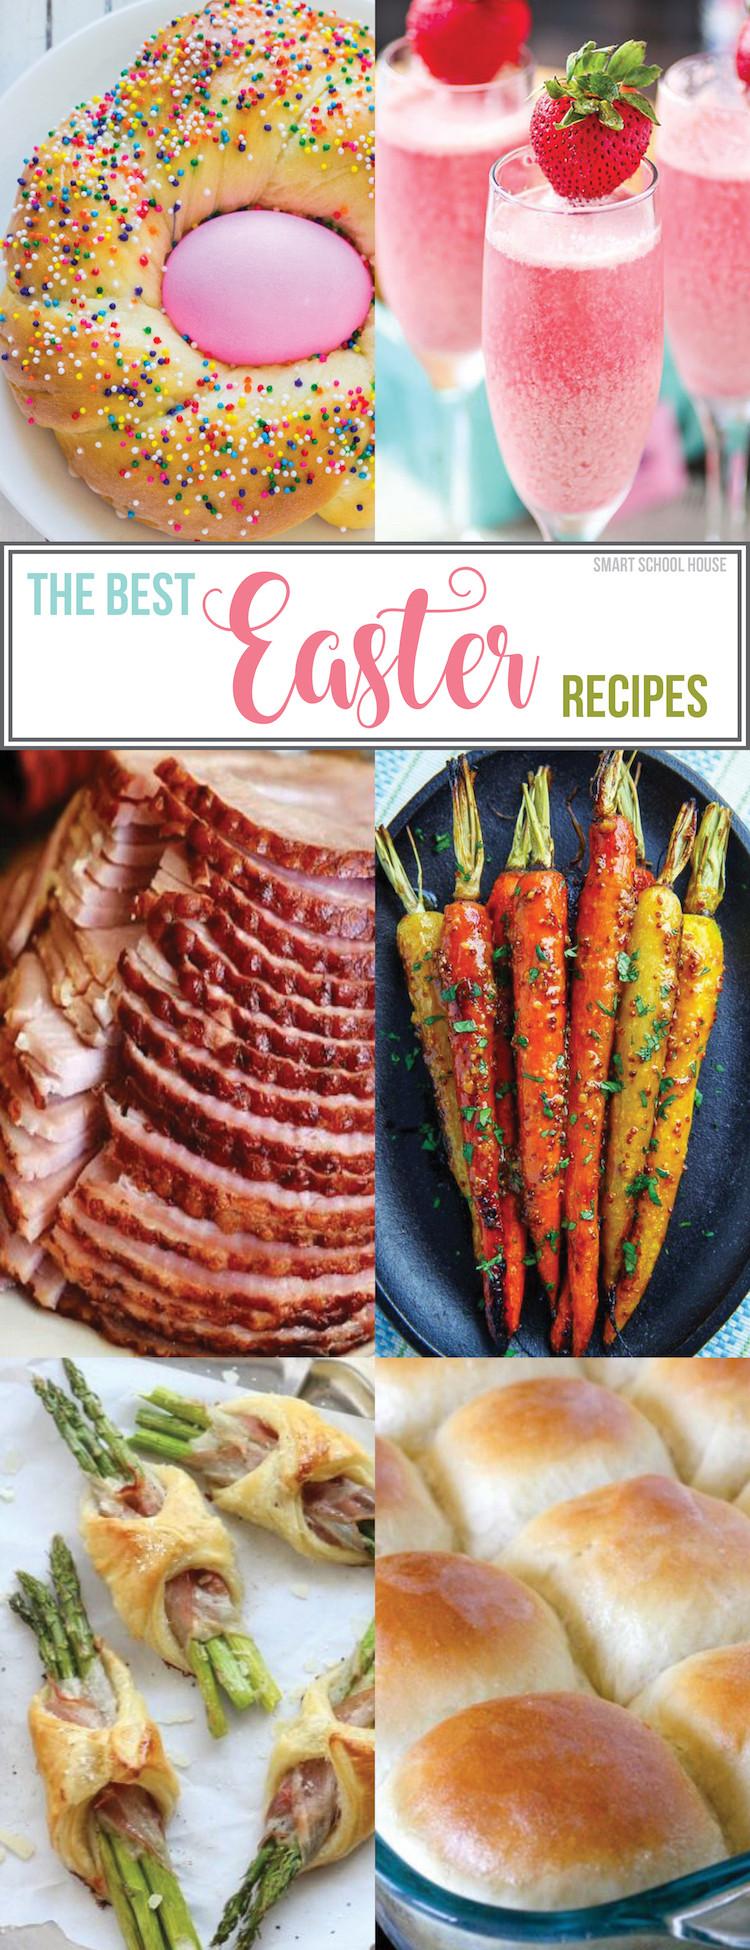 Best Easter Dinner Recipes  The Best Easter Recipes Smart School House